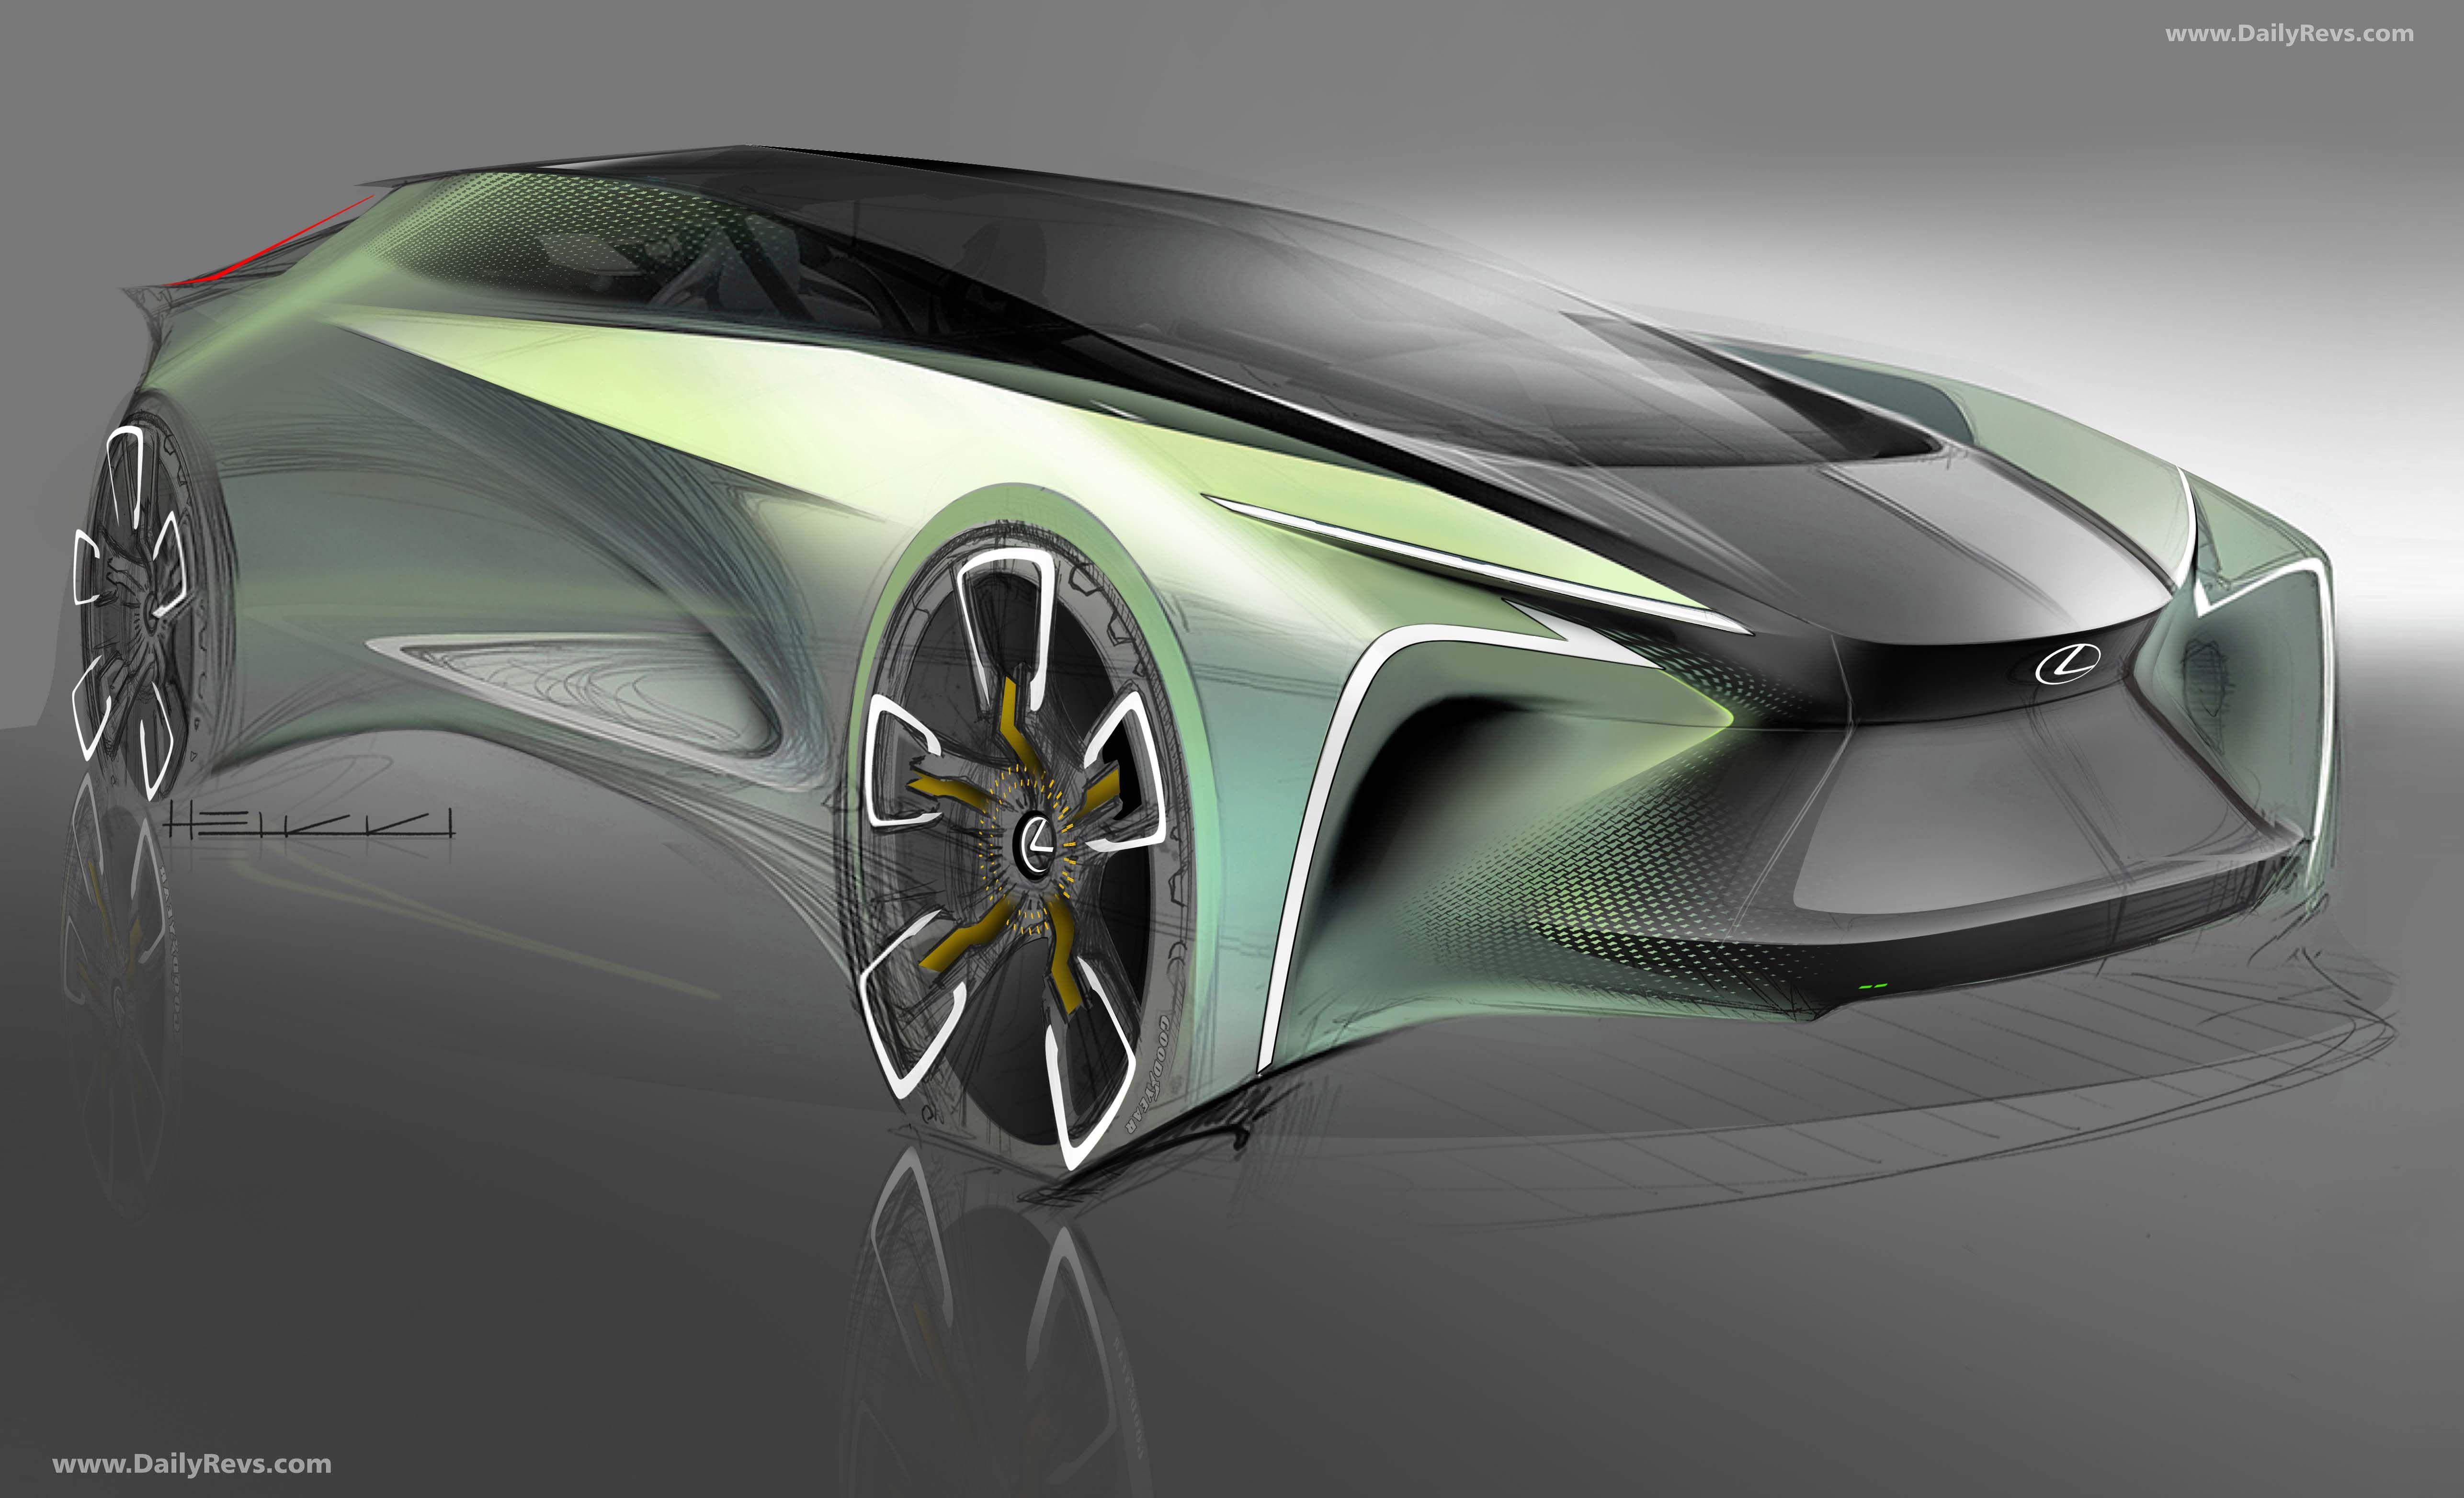 2019 Lexus LF-30 Electrified Concept - HD Pictures, Videos, Specs & Information - Dailyrevs